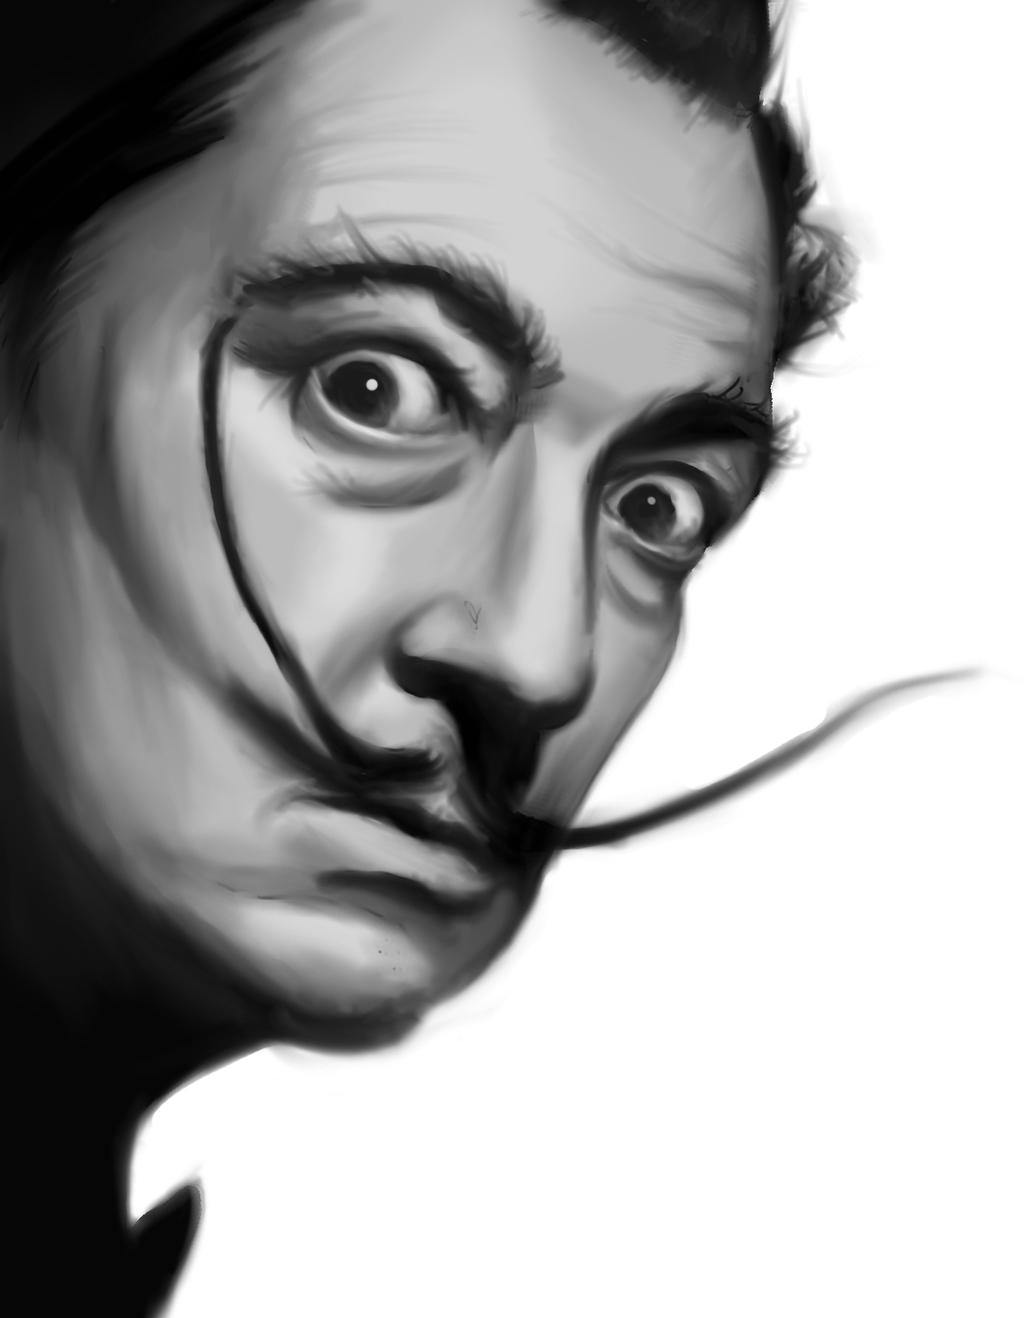 Salvador Dali Digital Painting